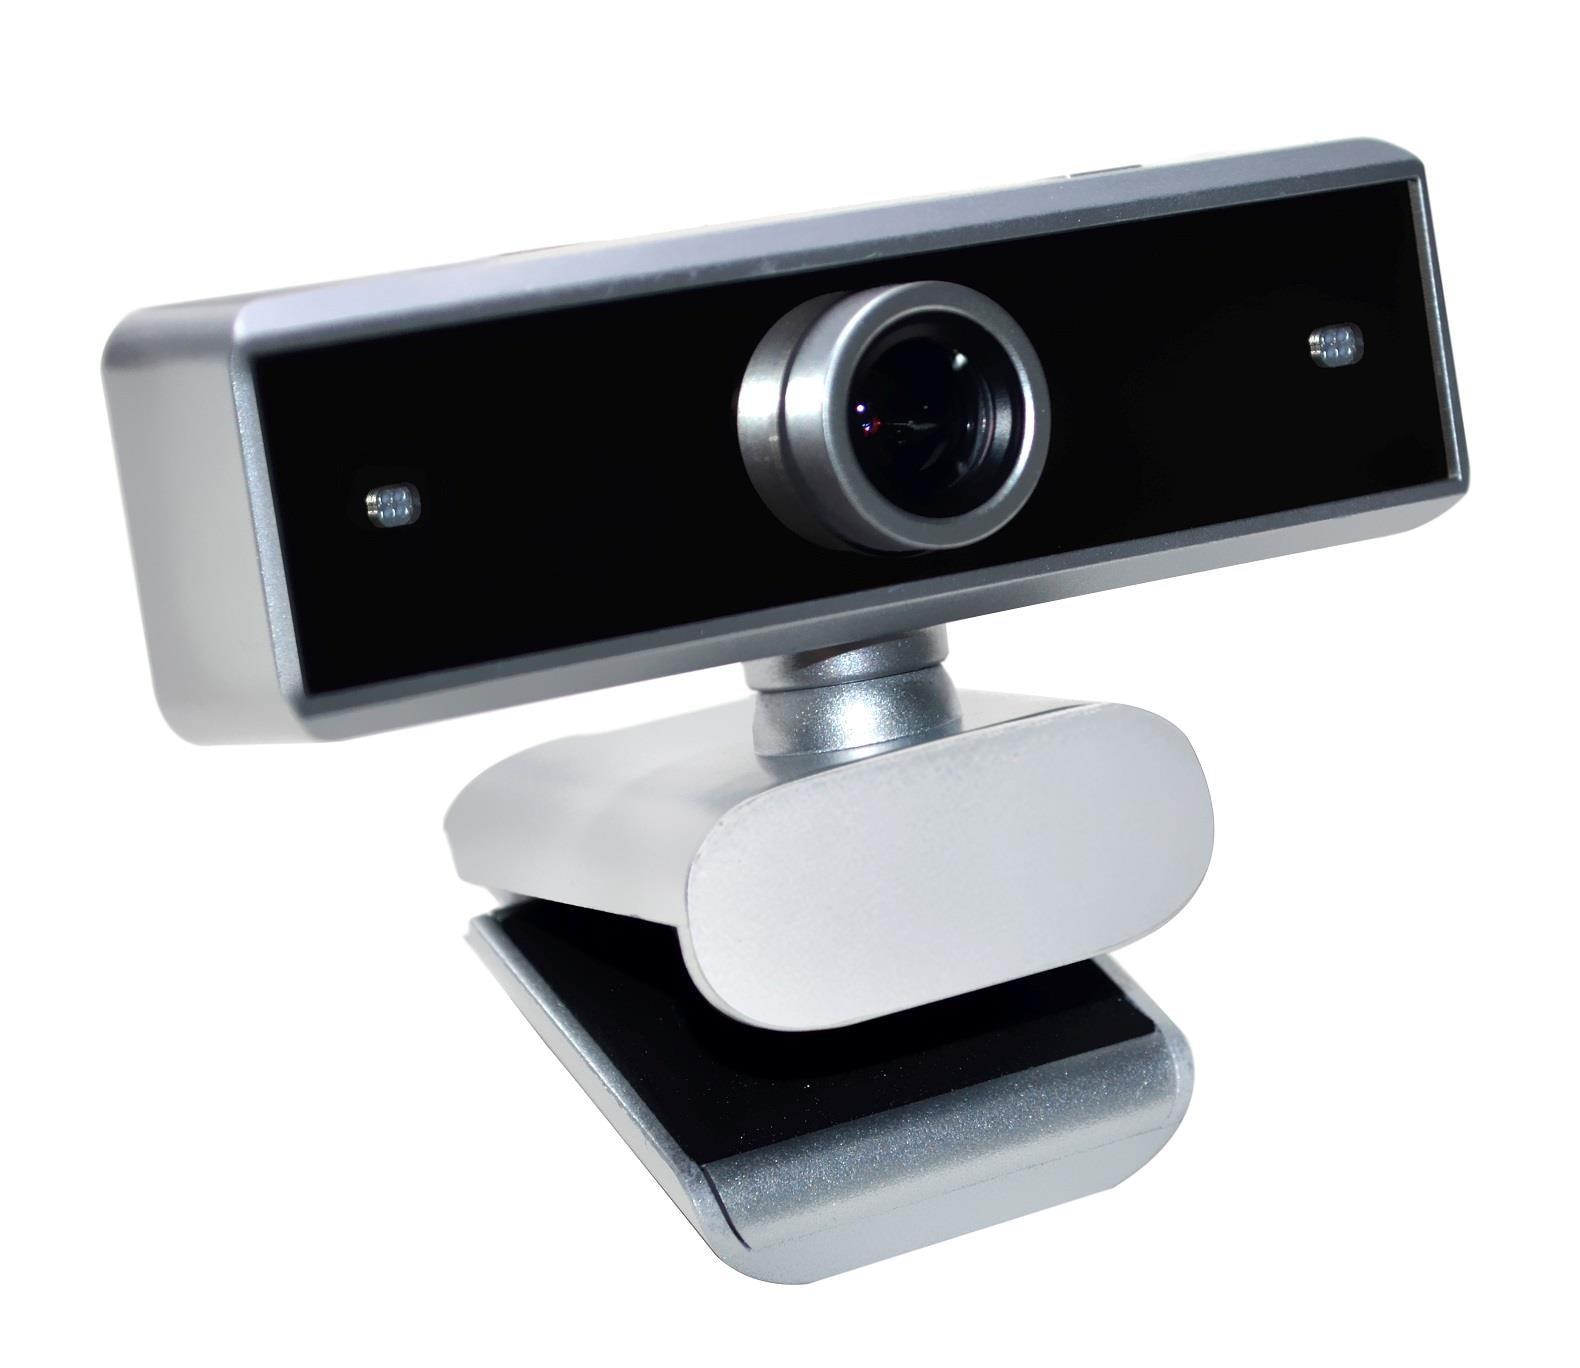 Kamera Internetowa Hd Vakoss Ws-3328X - 1